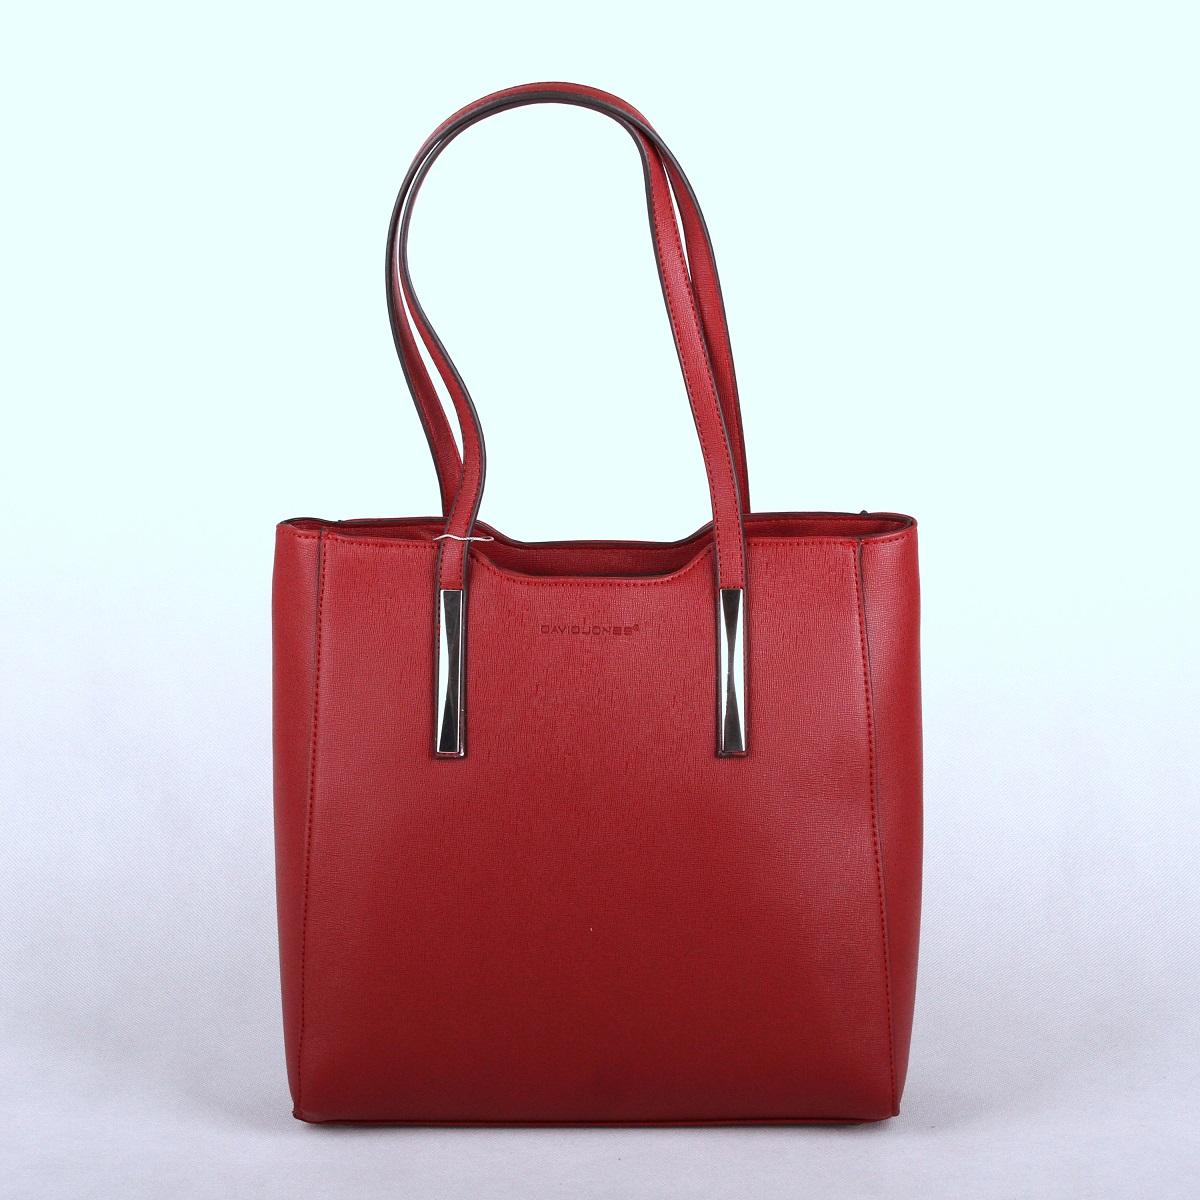 Velká tmavěčervená kabelka na rameno David Jones 5251-2